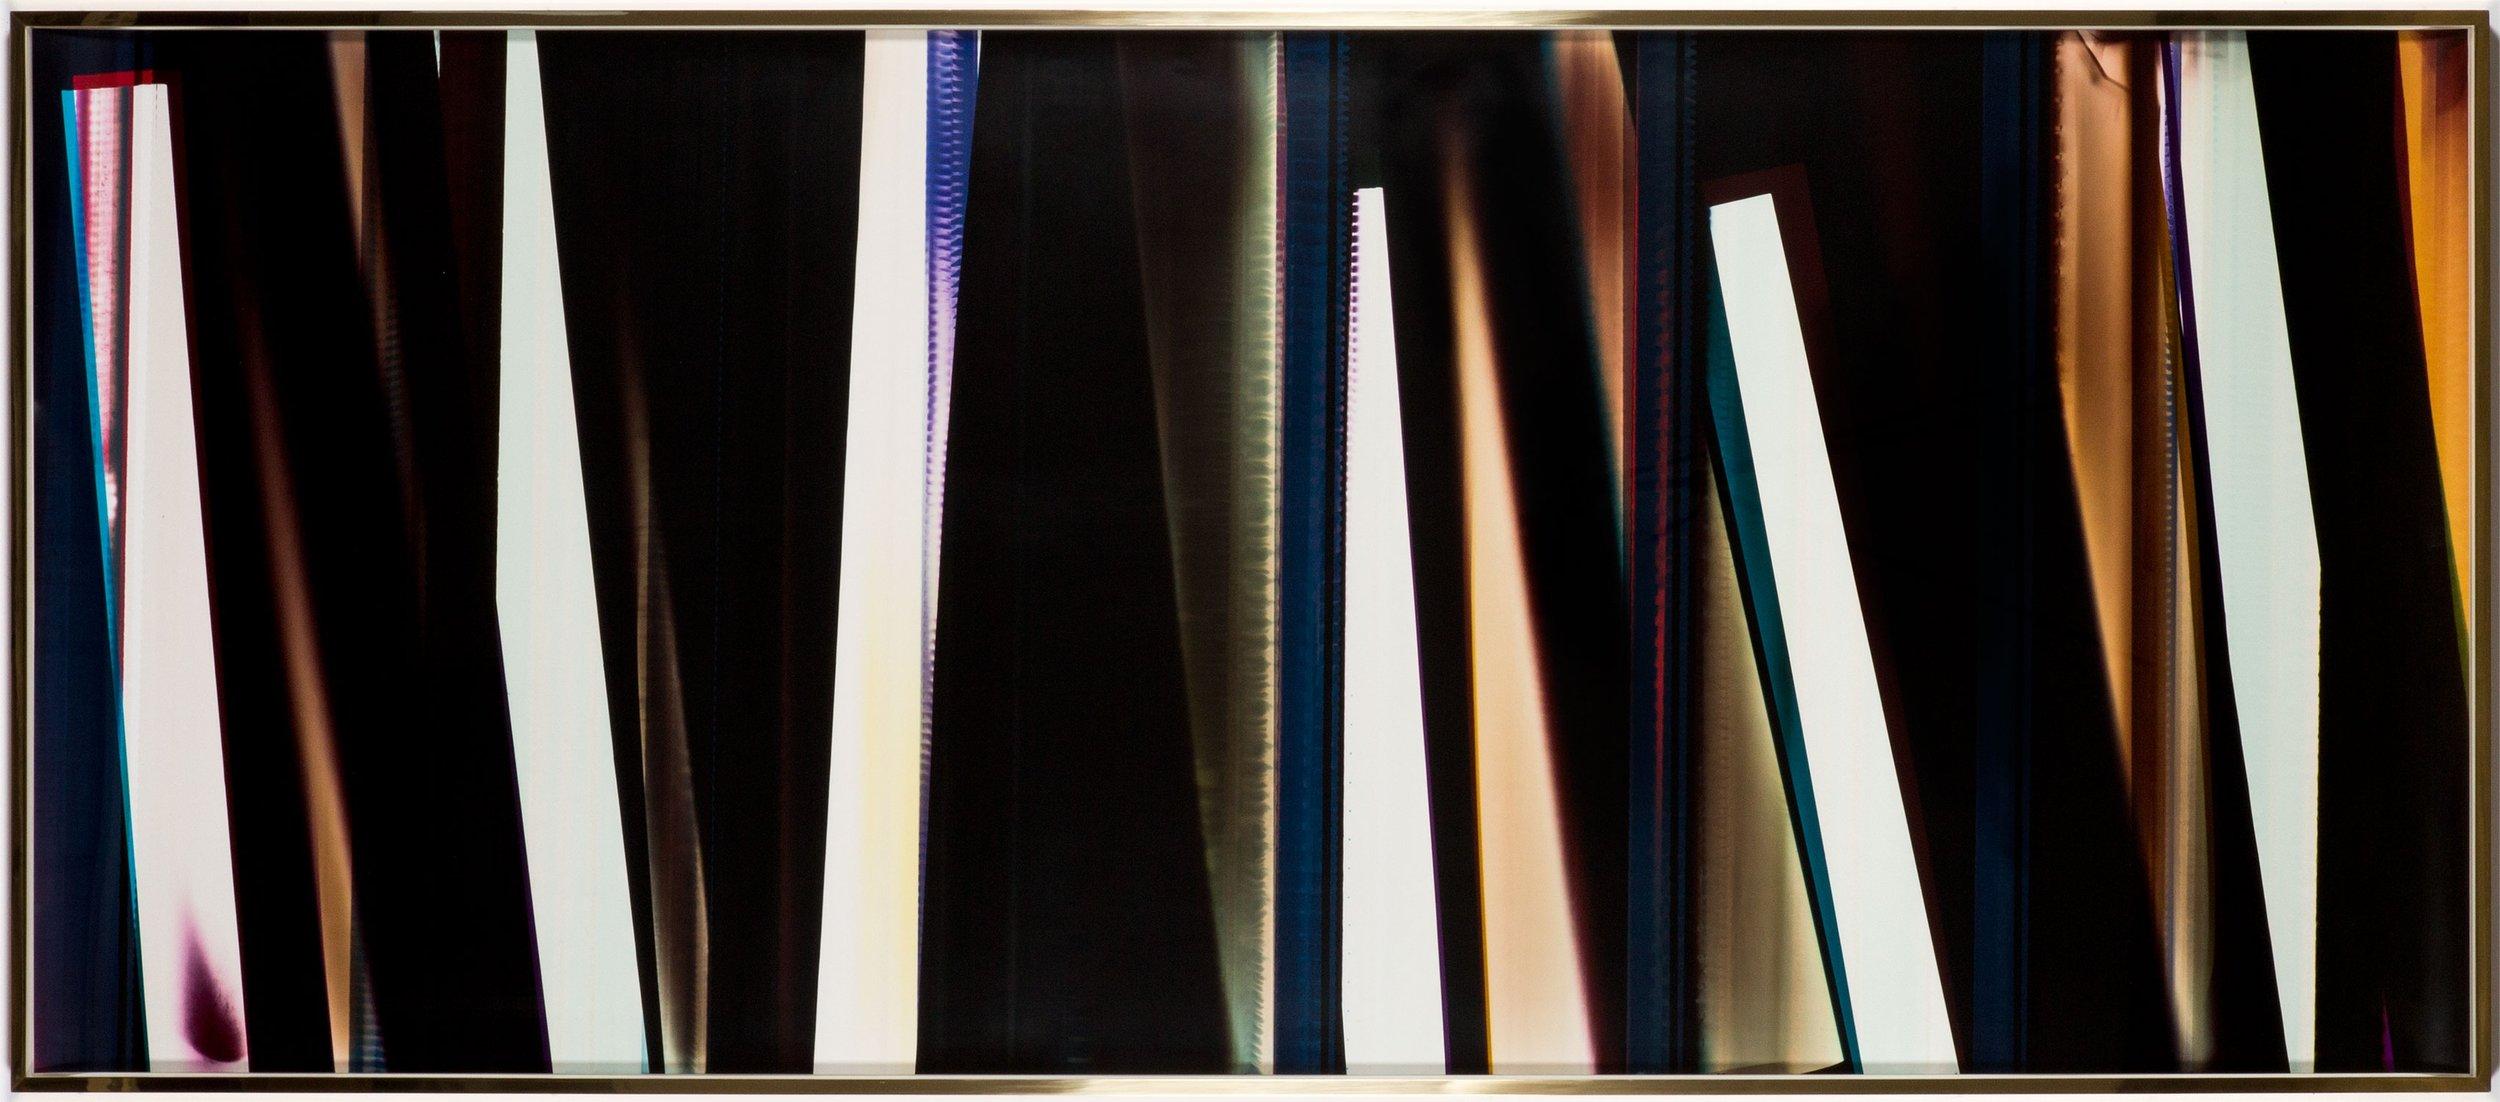 RA4 Contact Print / Processor Stall [Black Curl (9:6/MYC/Six Magnet: Los Angeles, California, July 15, 2014, Fuji Color Crystal Archive Super Type C, Em. No. 107-116, 75414), Kreonite KM IV 5225 RA4 Color Processor, Ser. No. 00092174] , 2016